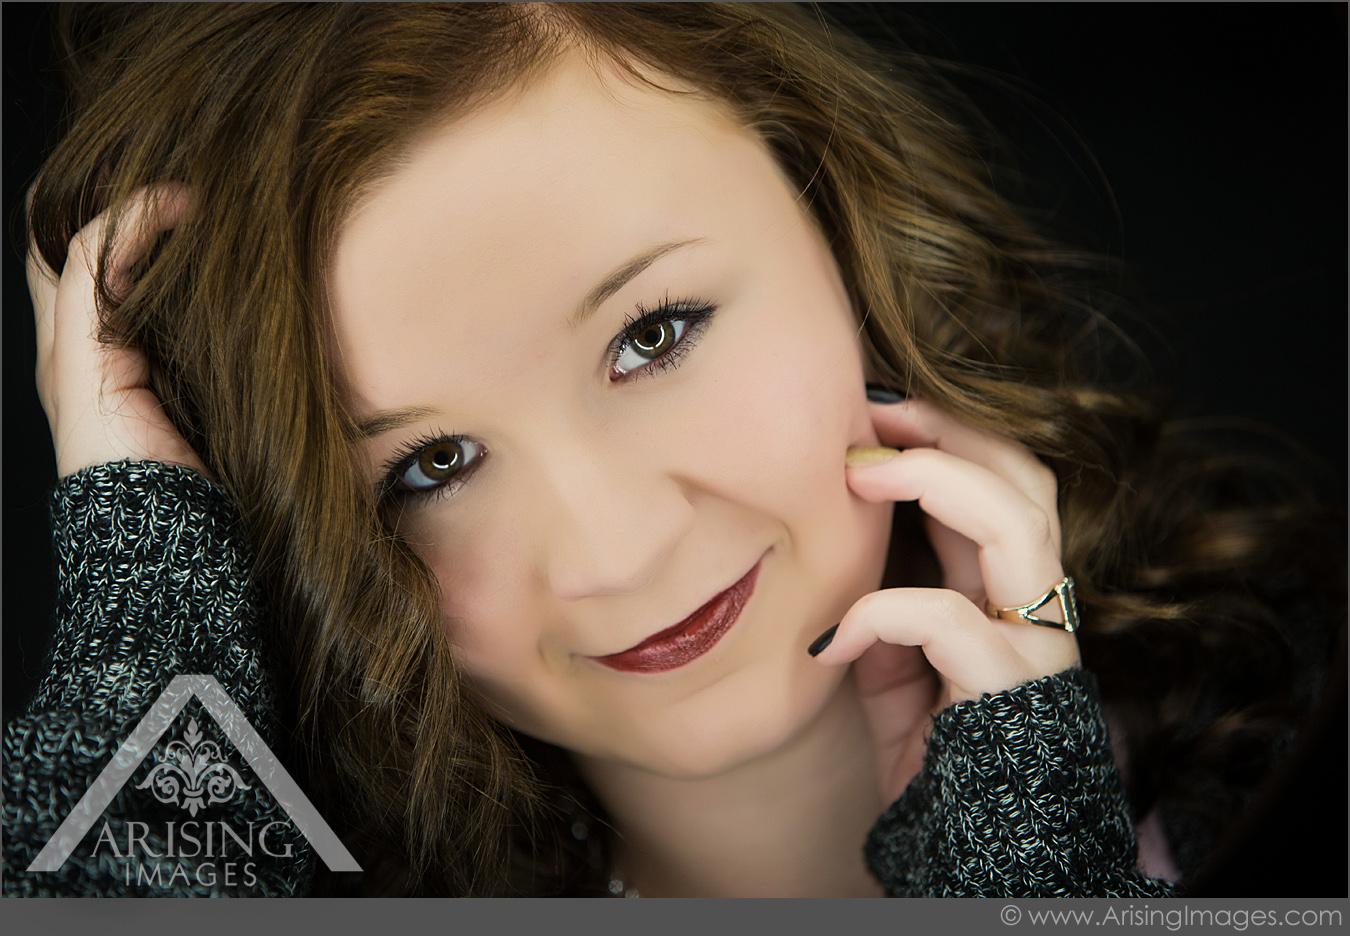 pretty high school model pictures in michigan